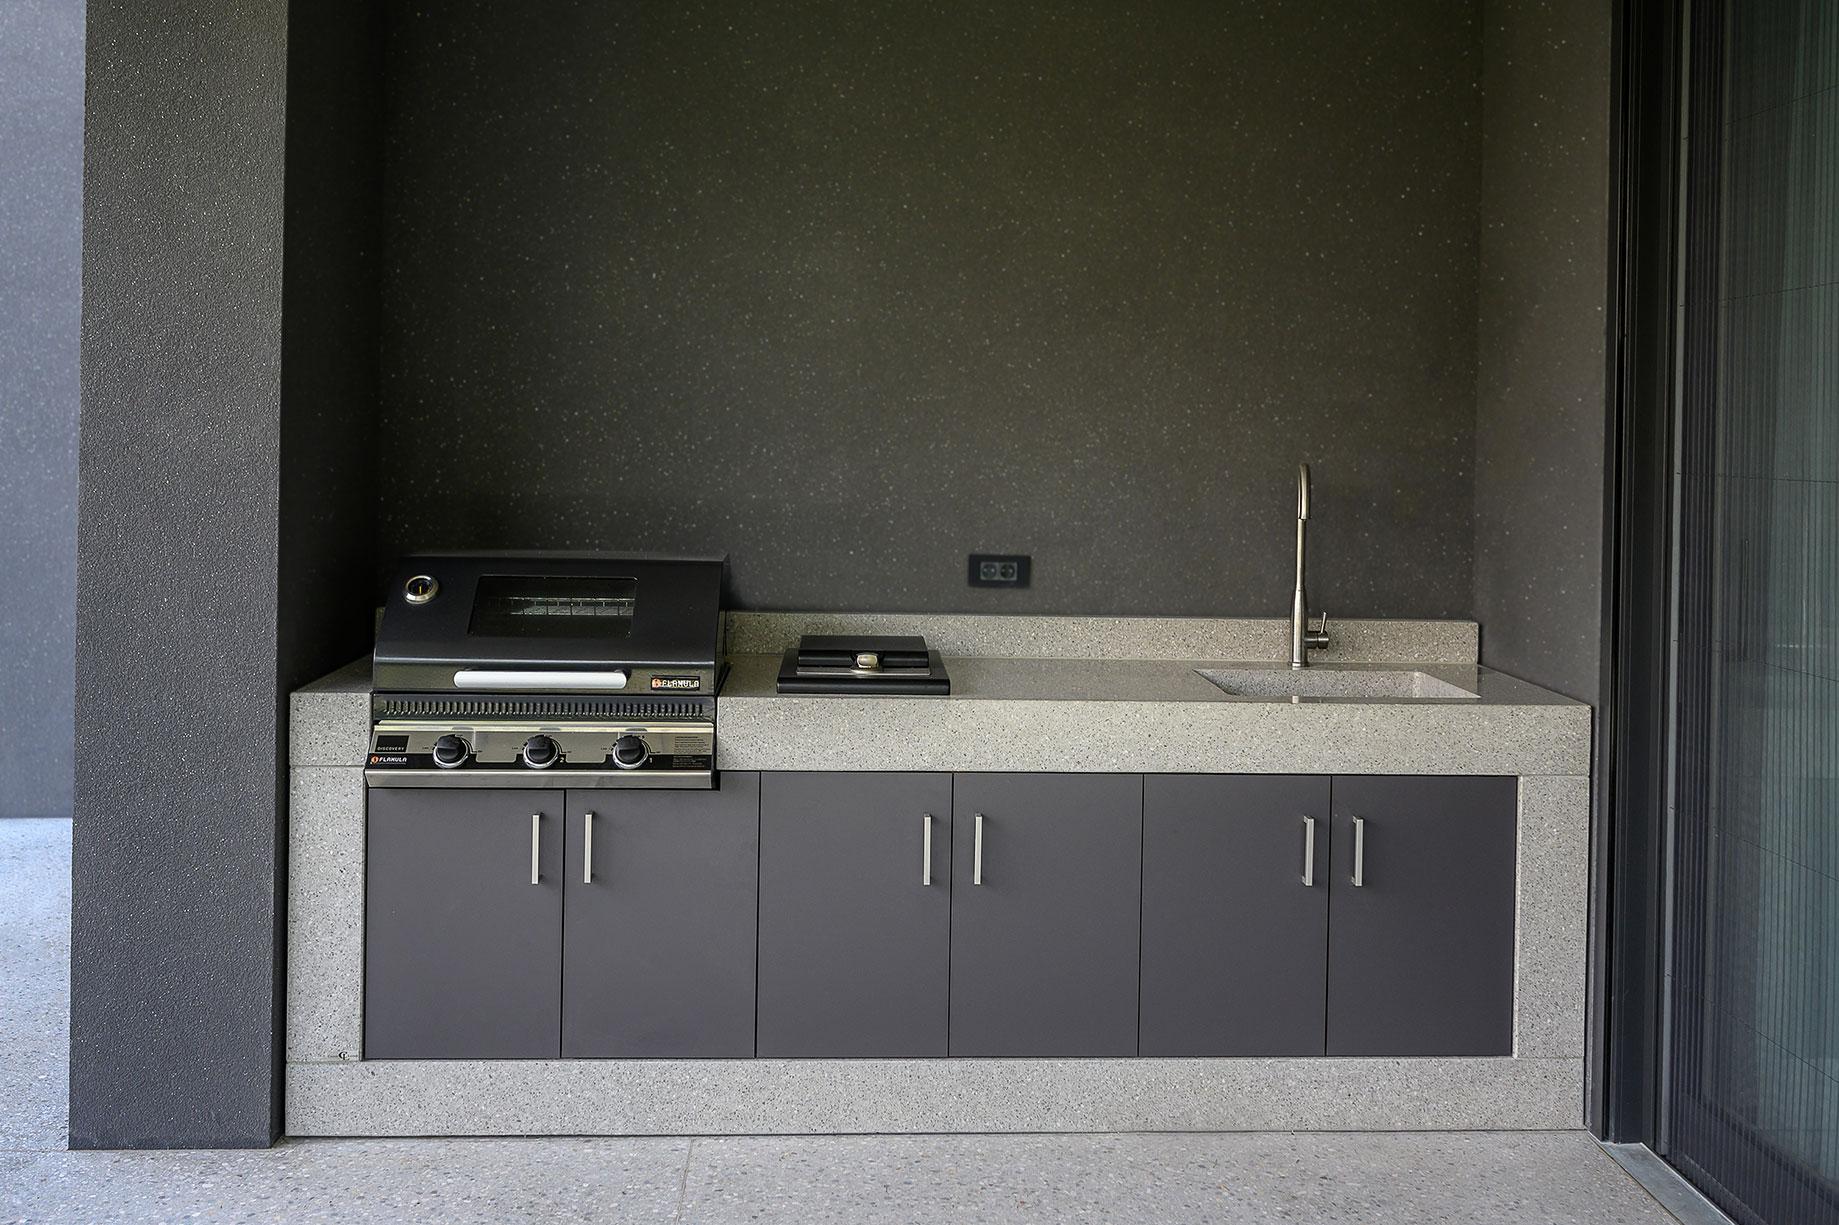 lerock-galerija-1